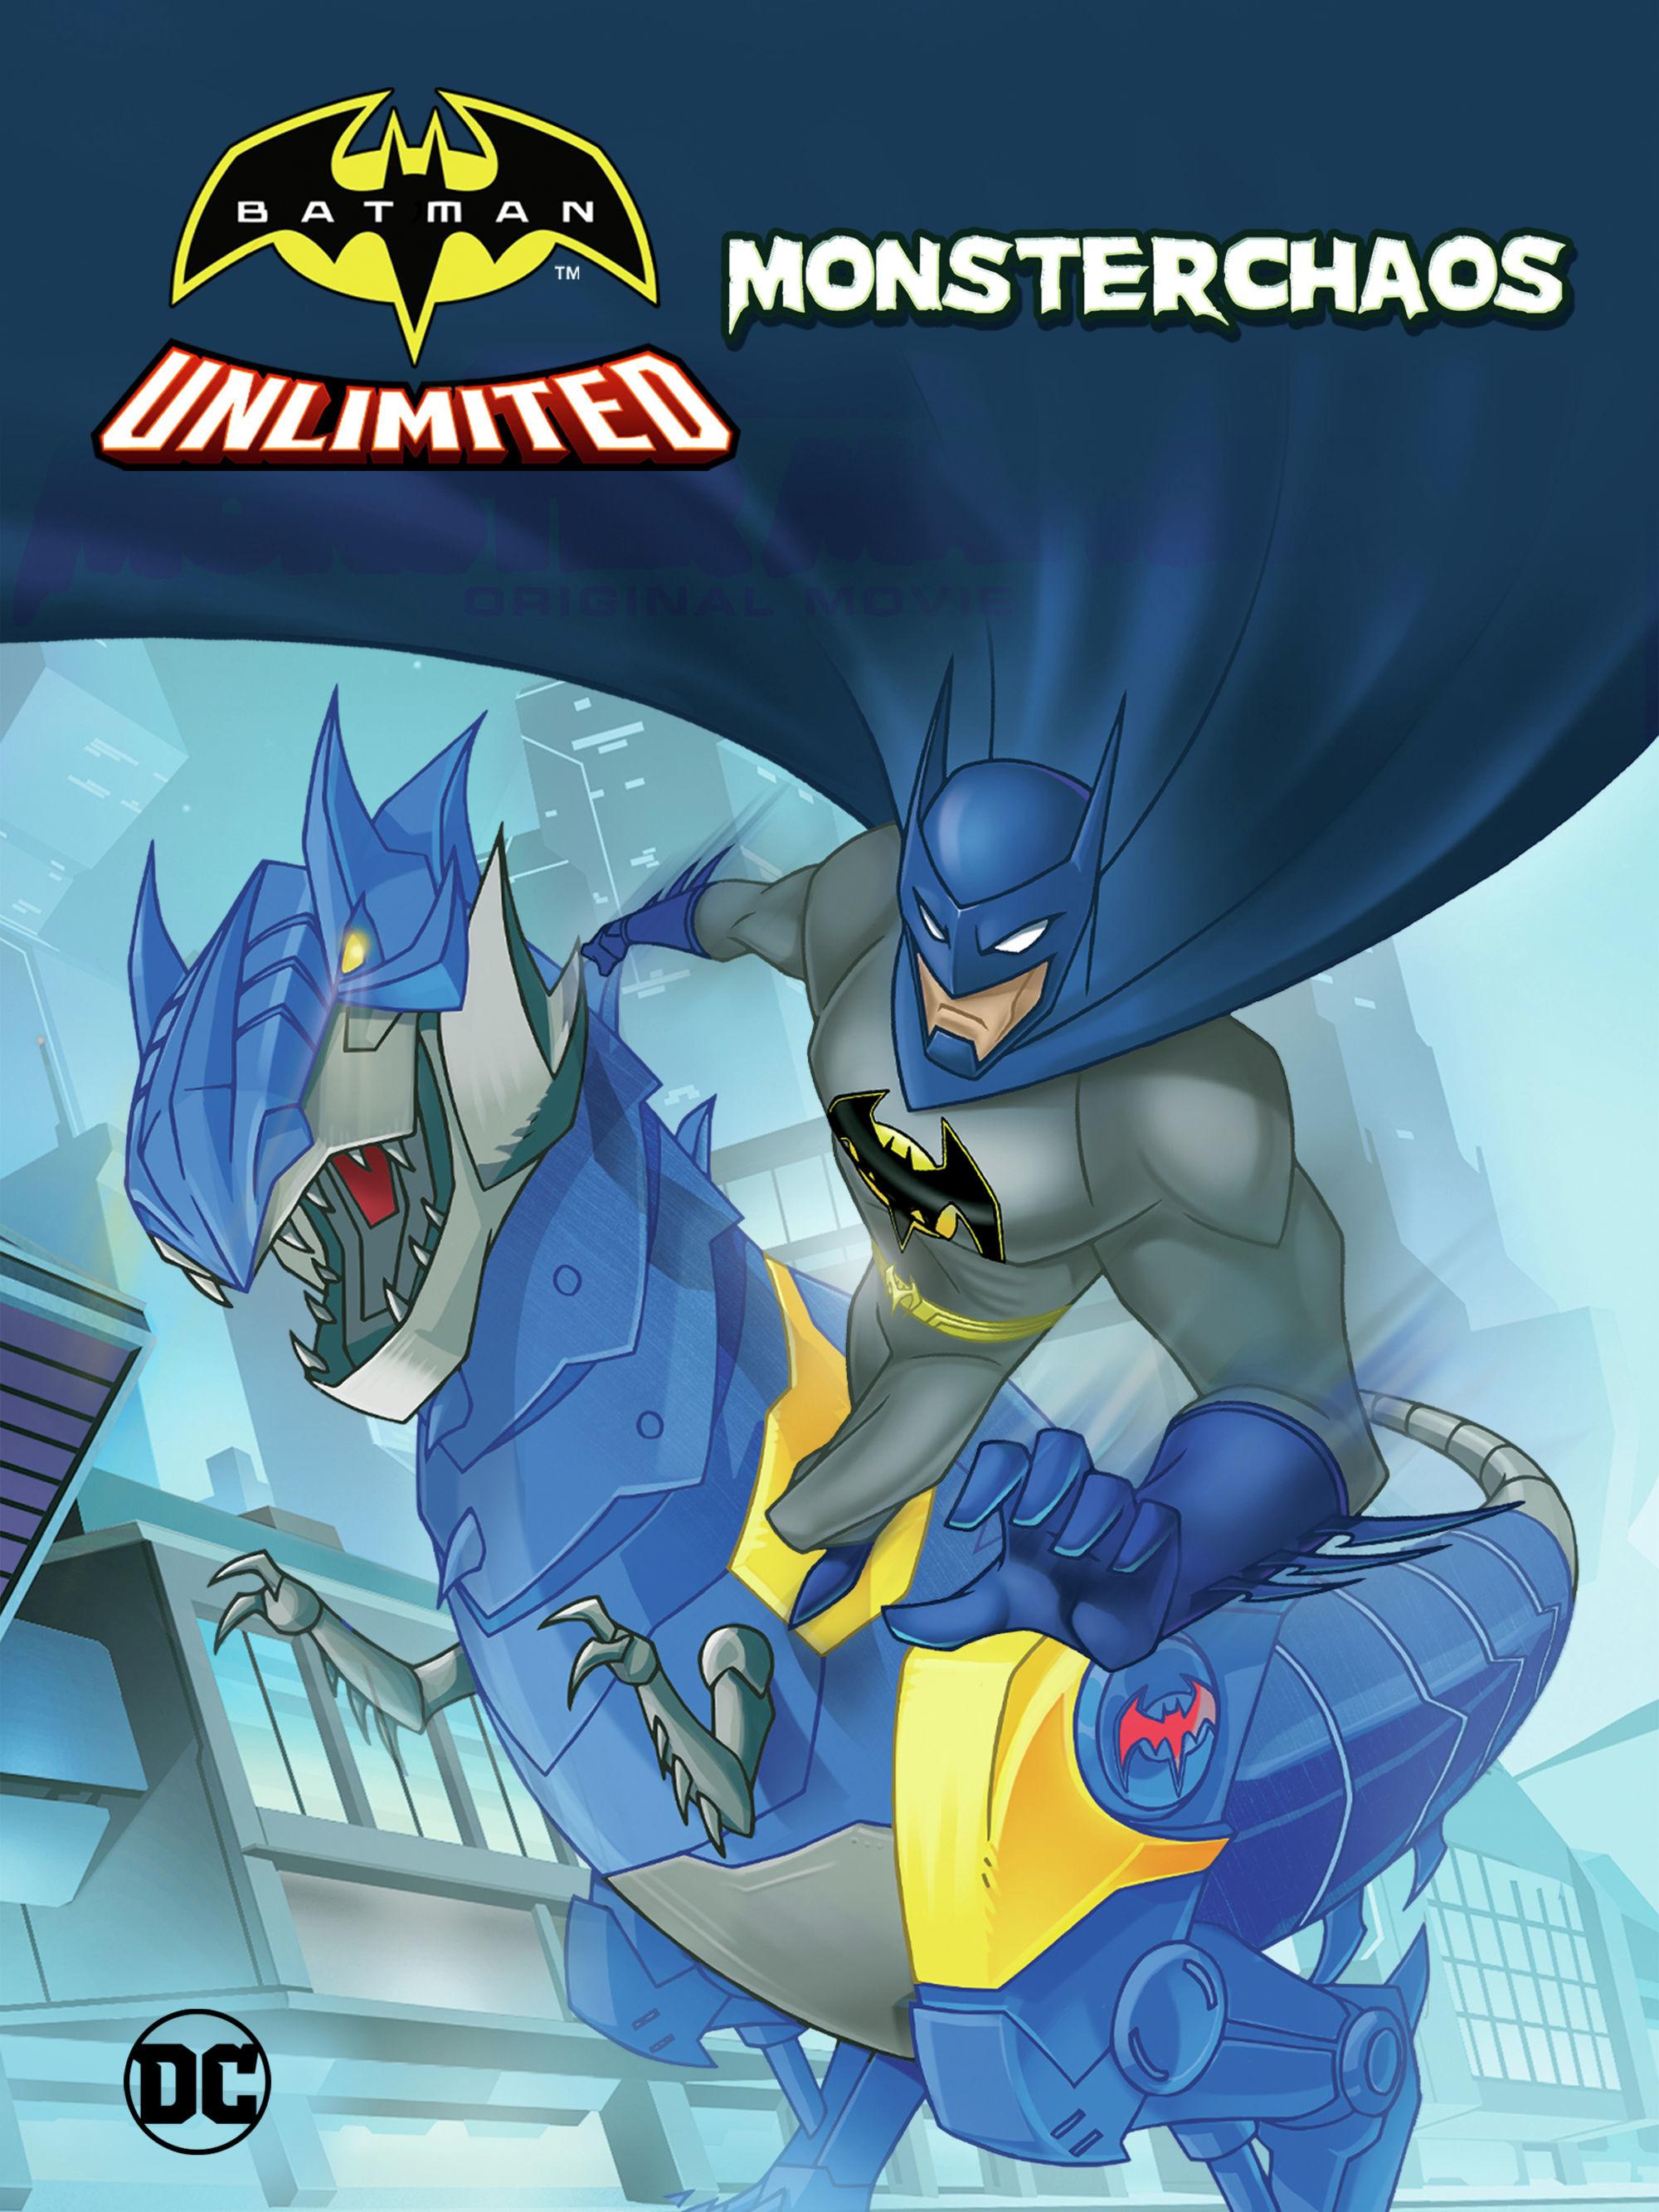 Batman Unlimited - Monster Chaos